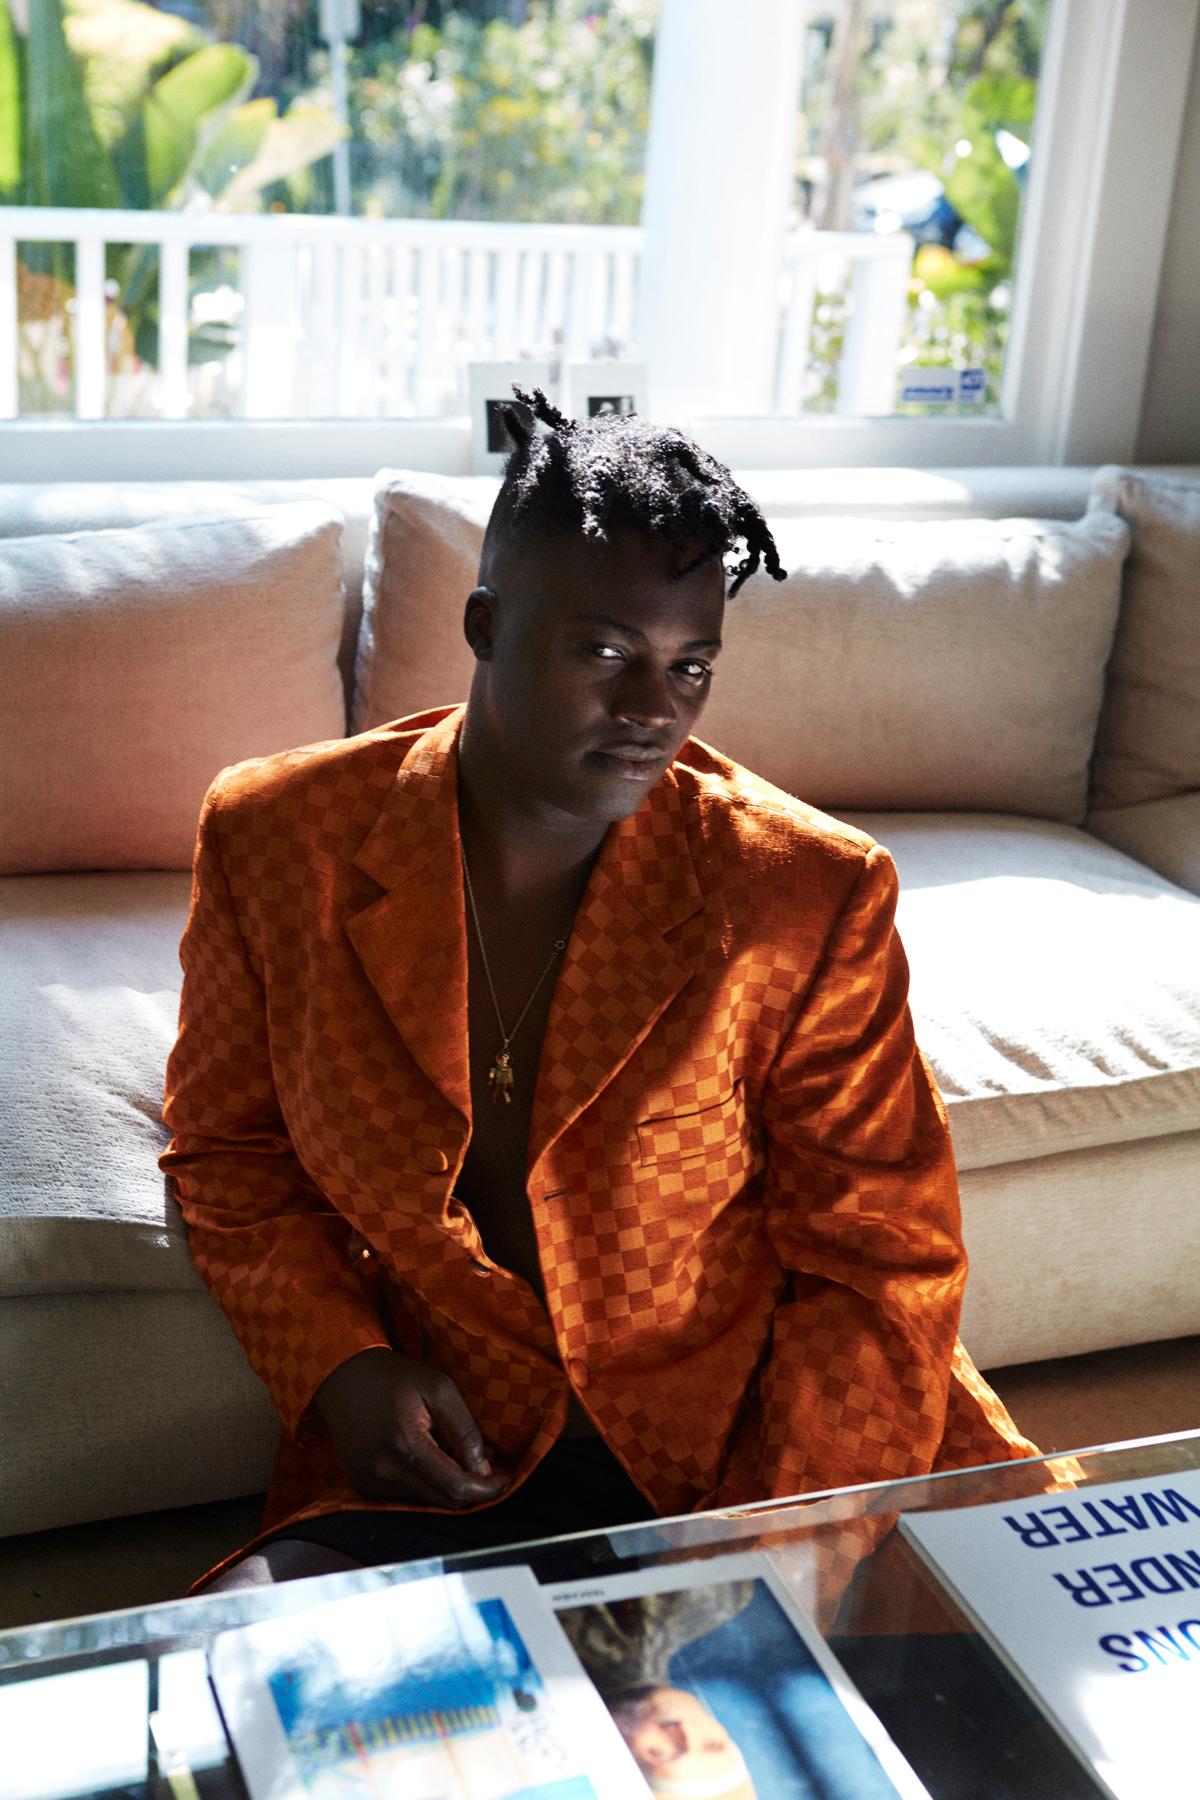 Bipolar Sunshine, singer writing lyrics at home in Los Angeles 2017. Photography By Ioannis Koussertari